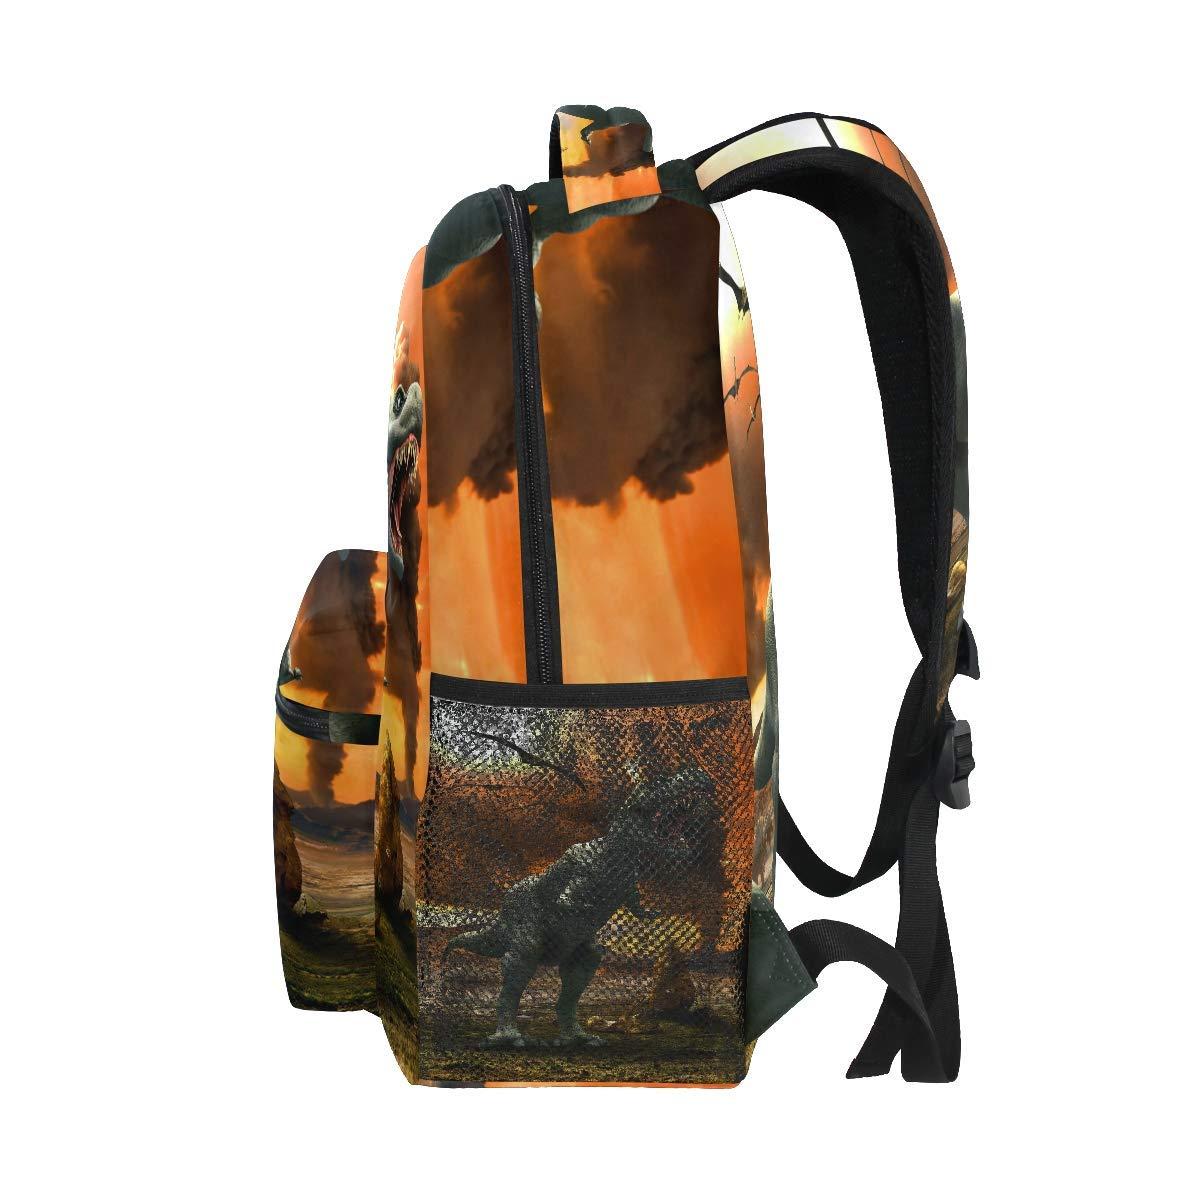 Mochilas Jurassic Park 3D Dinosaur Kids School Bookbags Laptop Travel Daypack Bag Purse for Boys